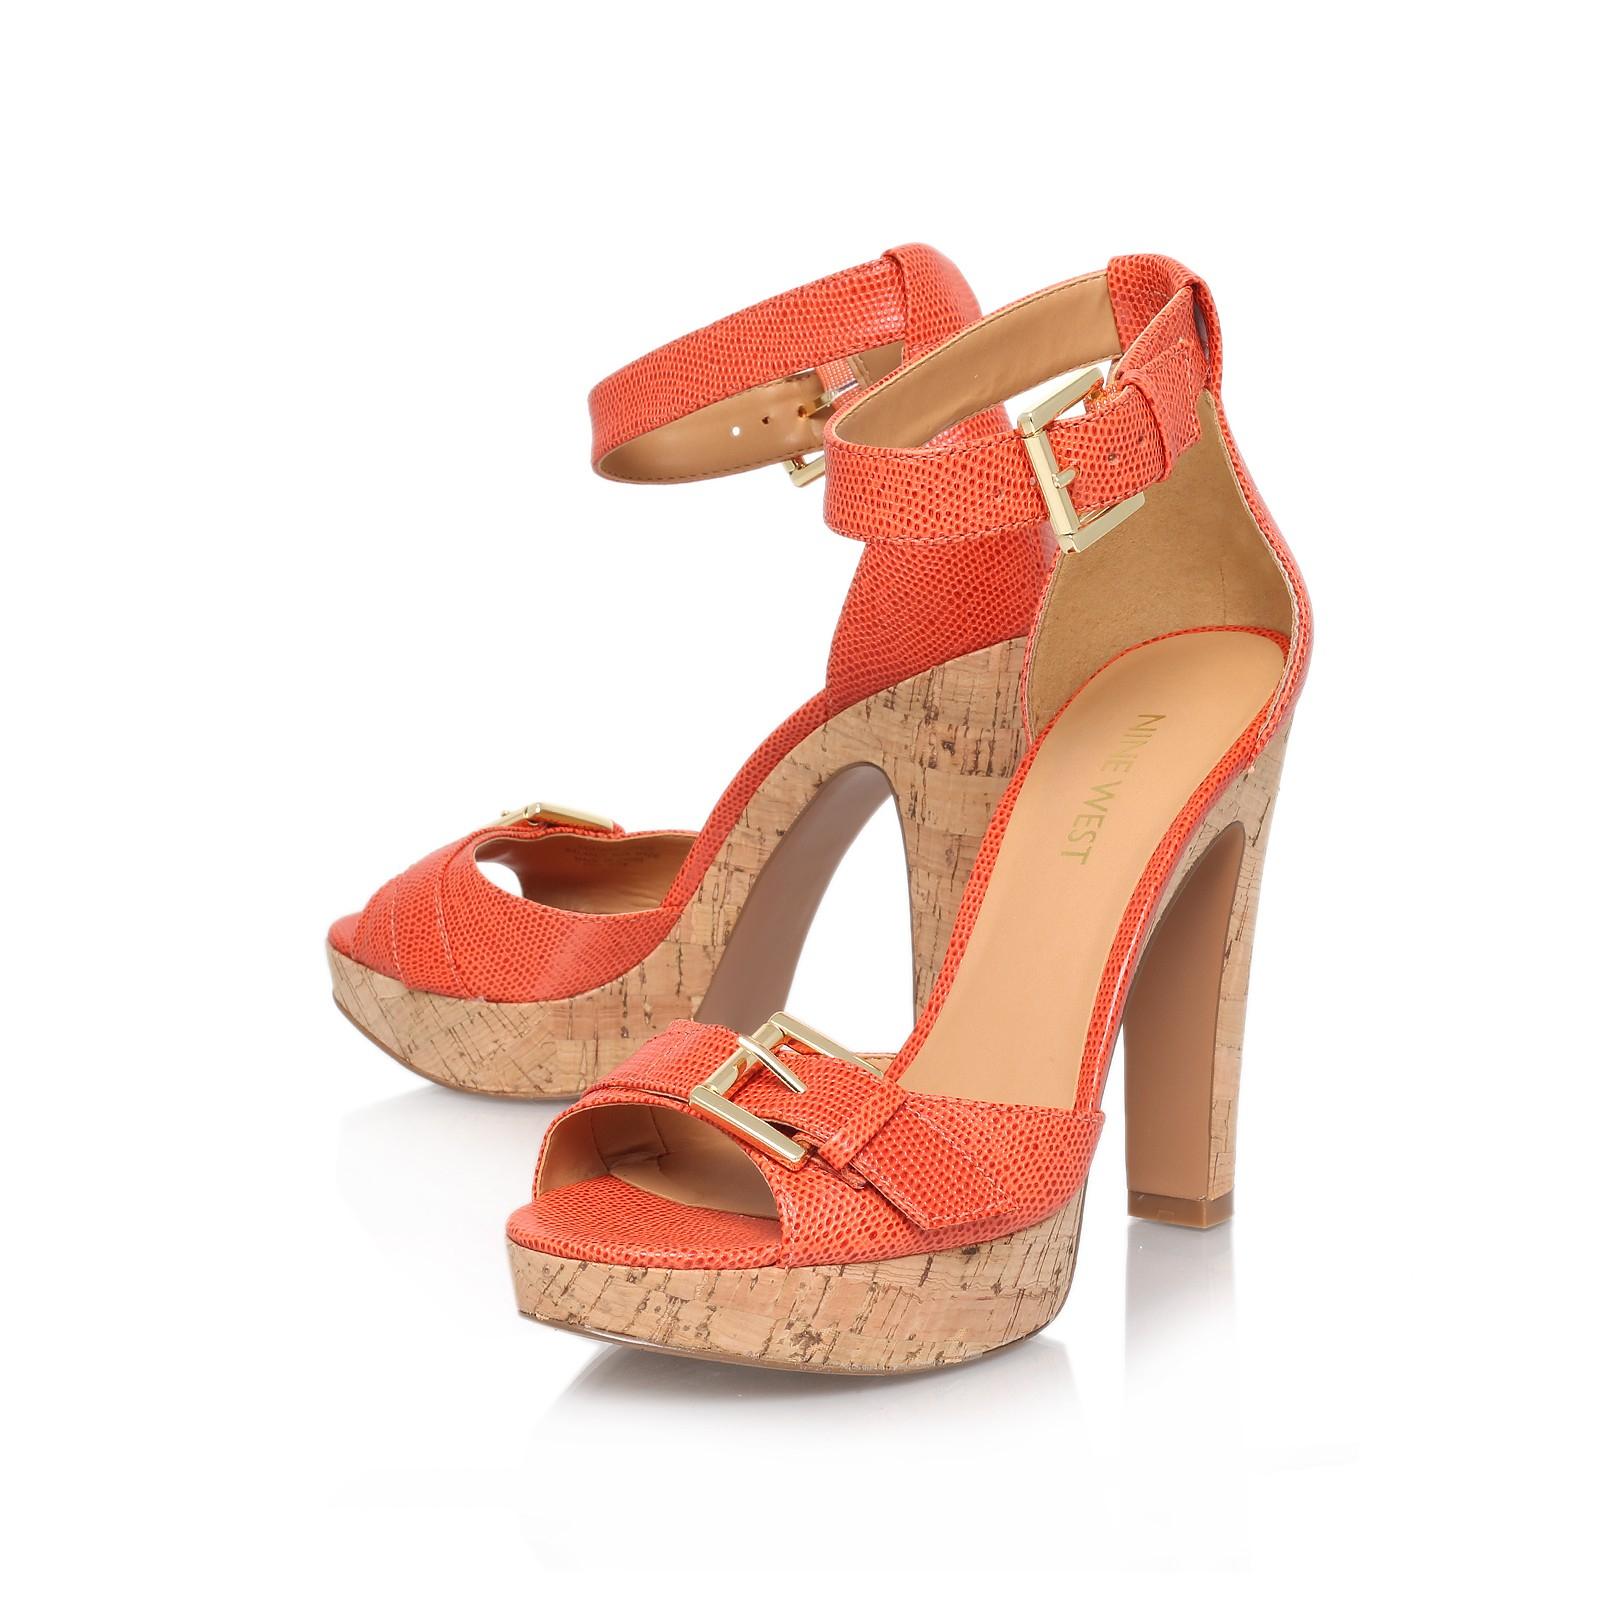 Nine West White Court Shoes